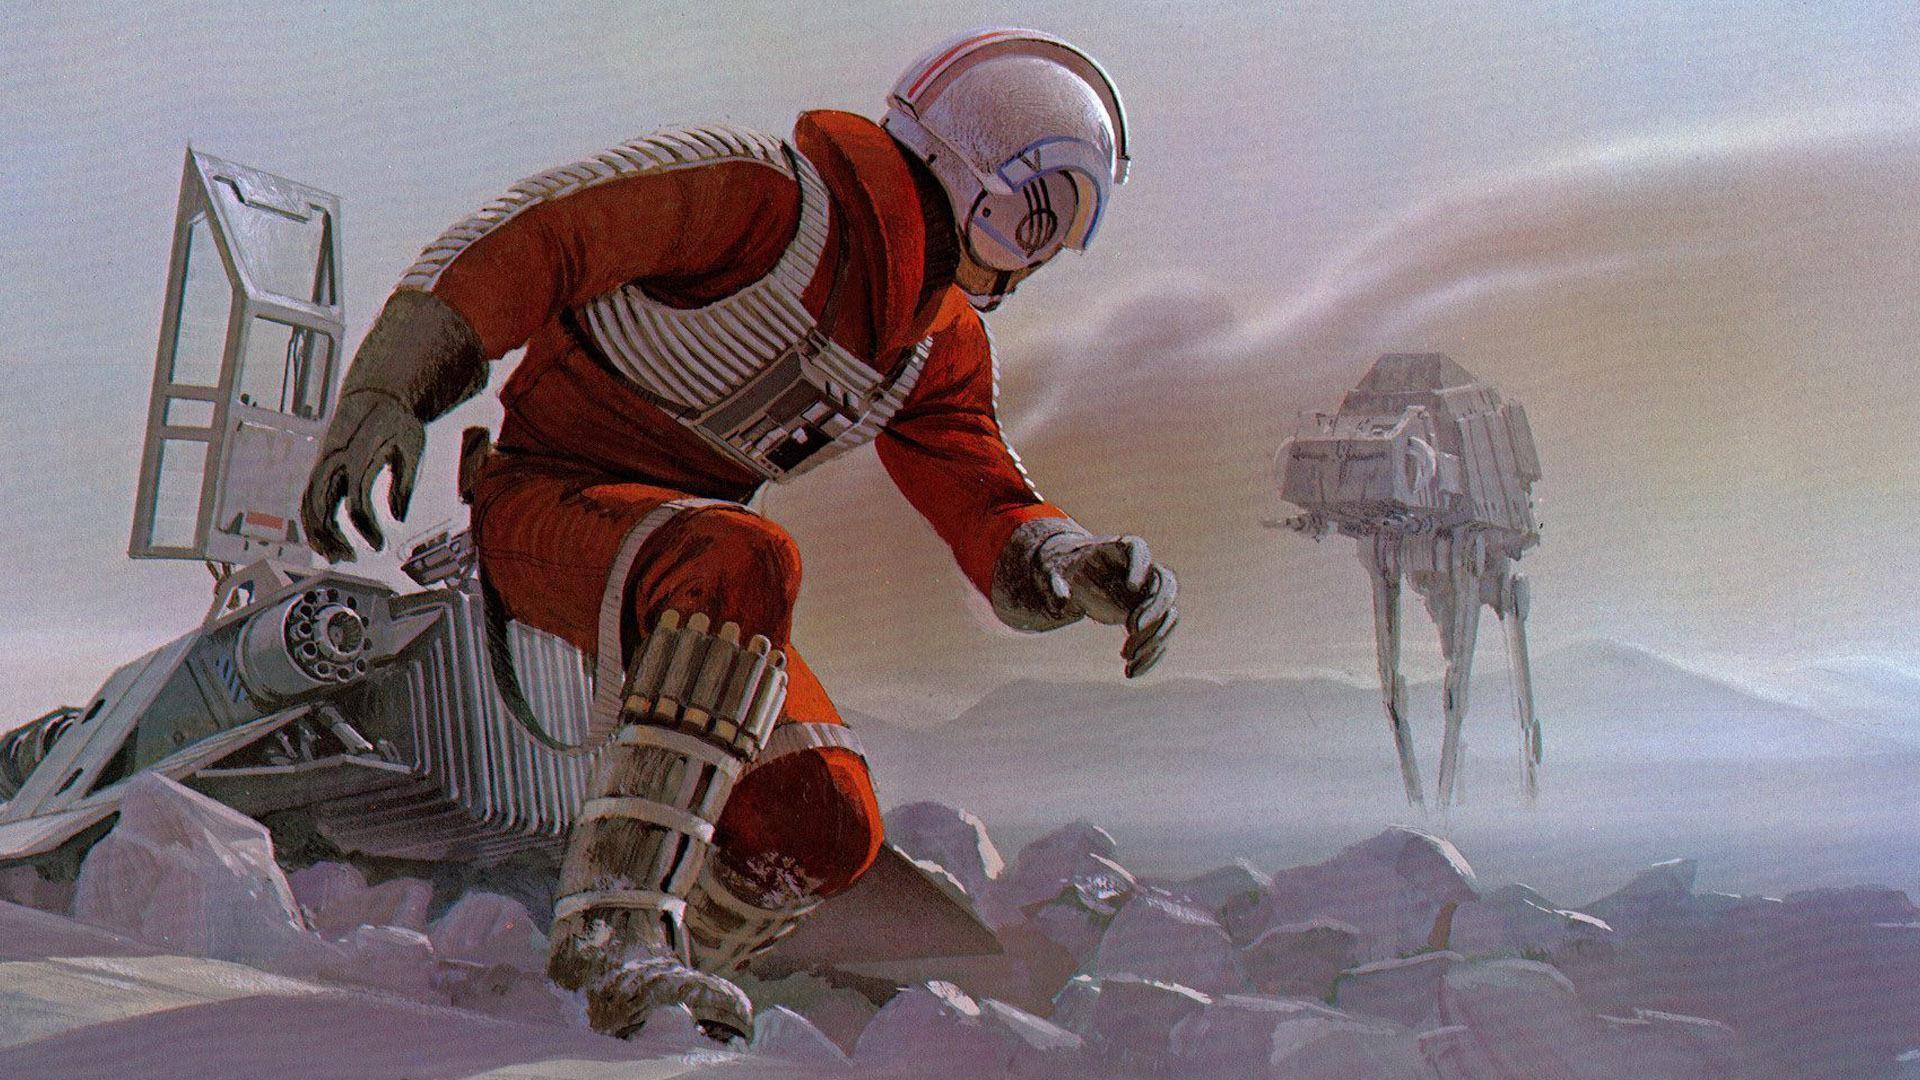 Luke Skywalker Wallpaper HD (72+ images)